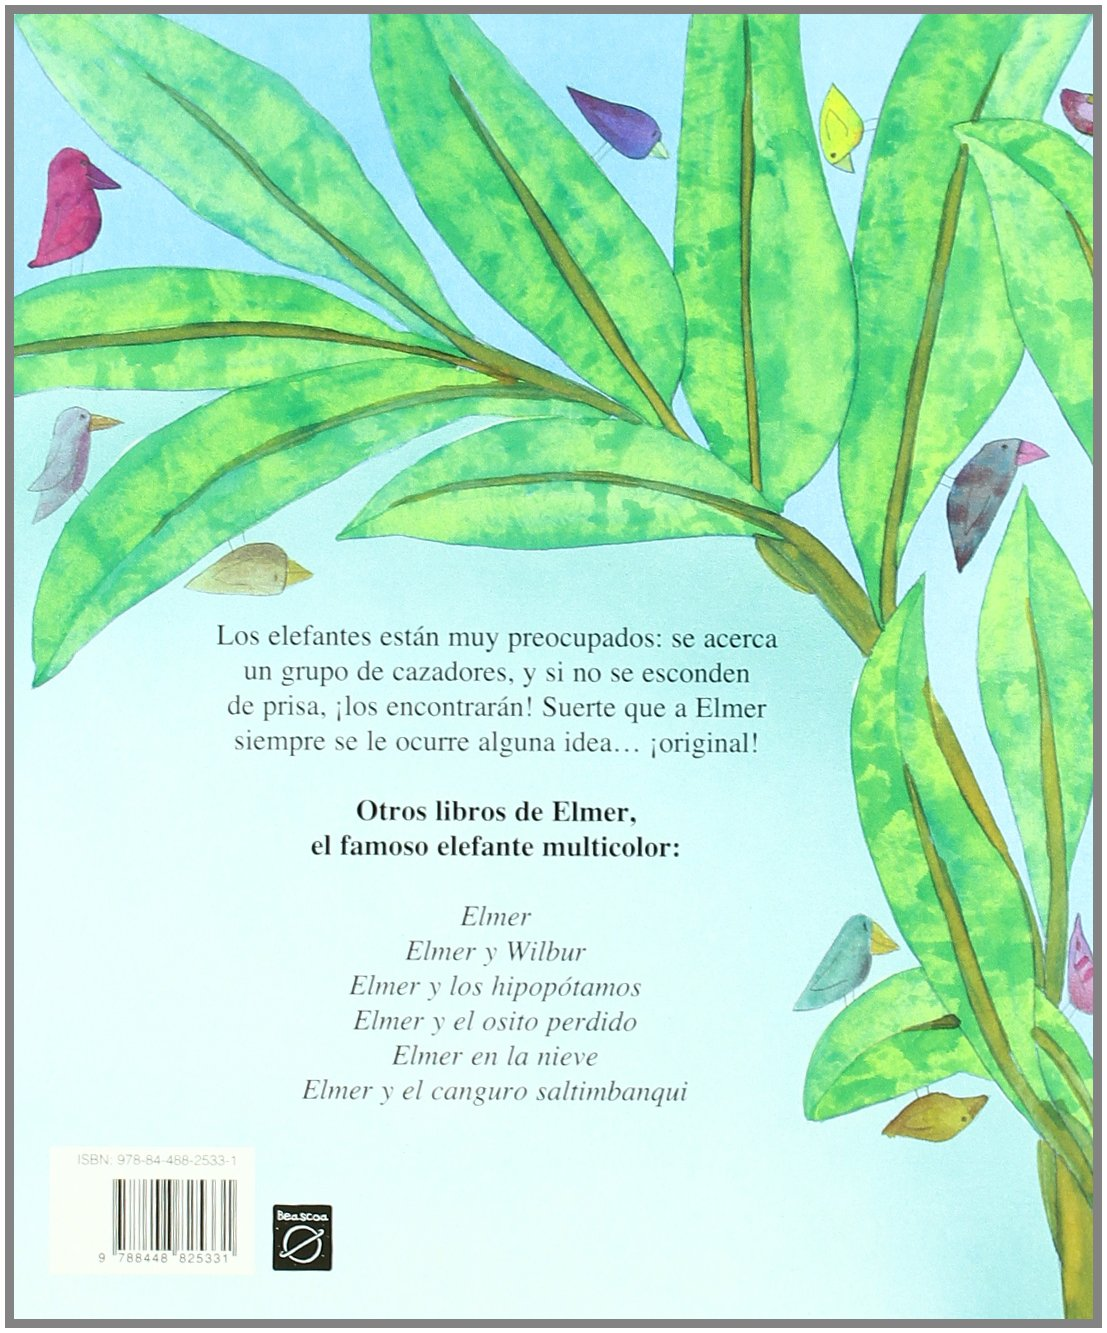 Que gran idea, Elmer! / Elmer on Stilts (Spanish Edition) by Beascoa Ediciones